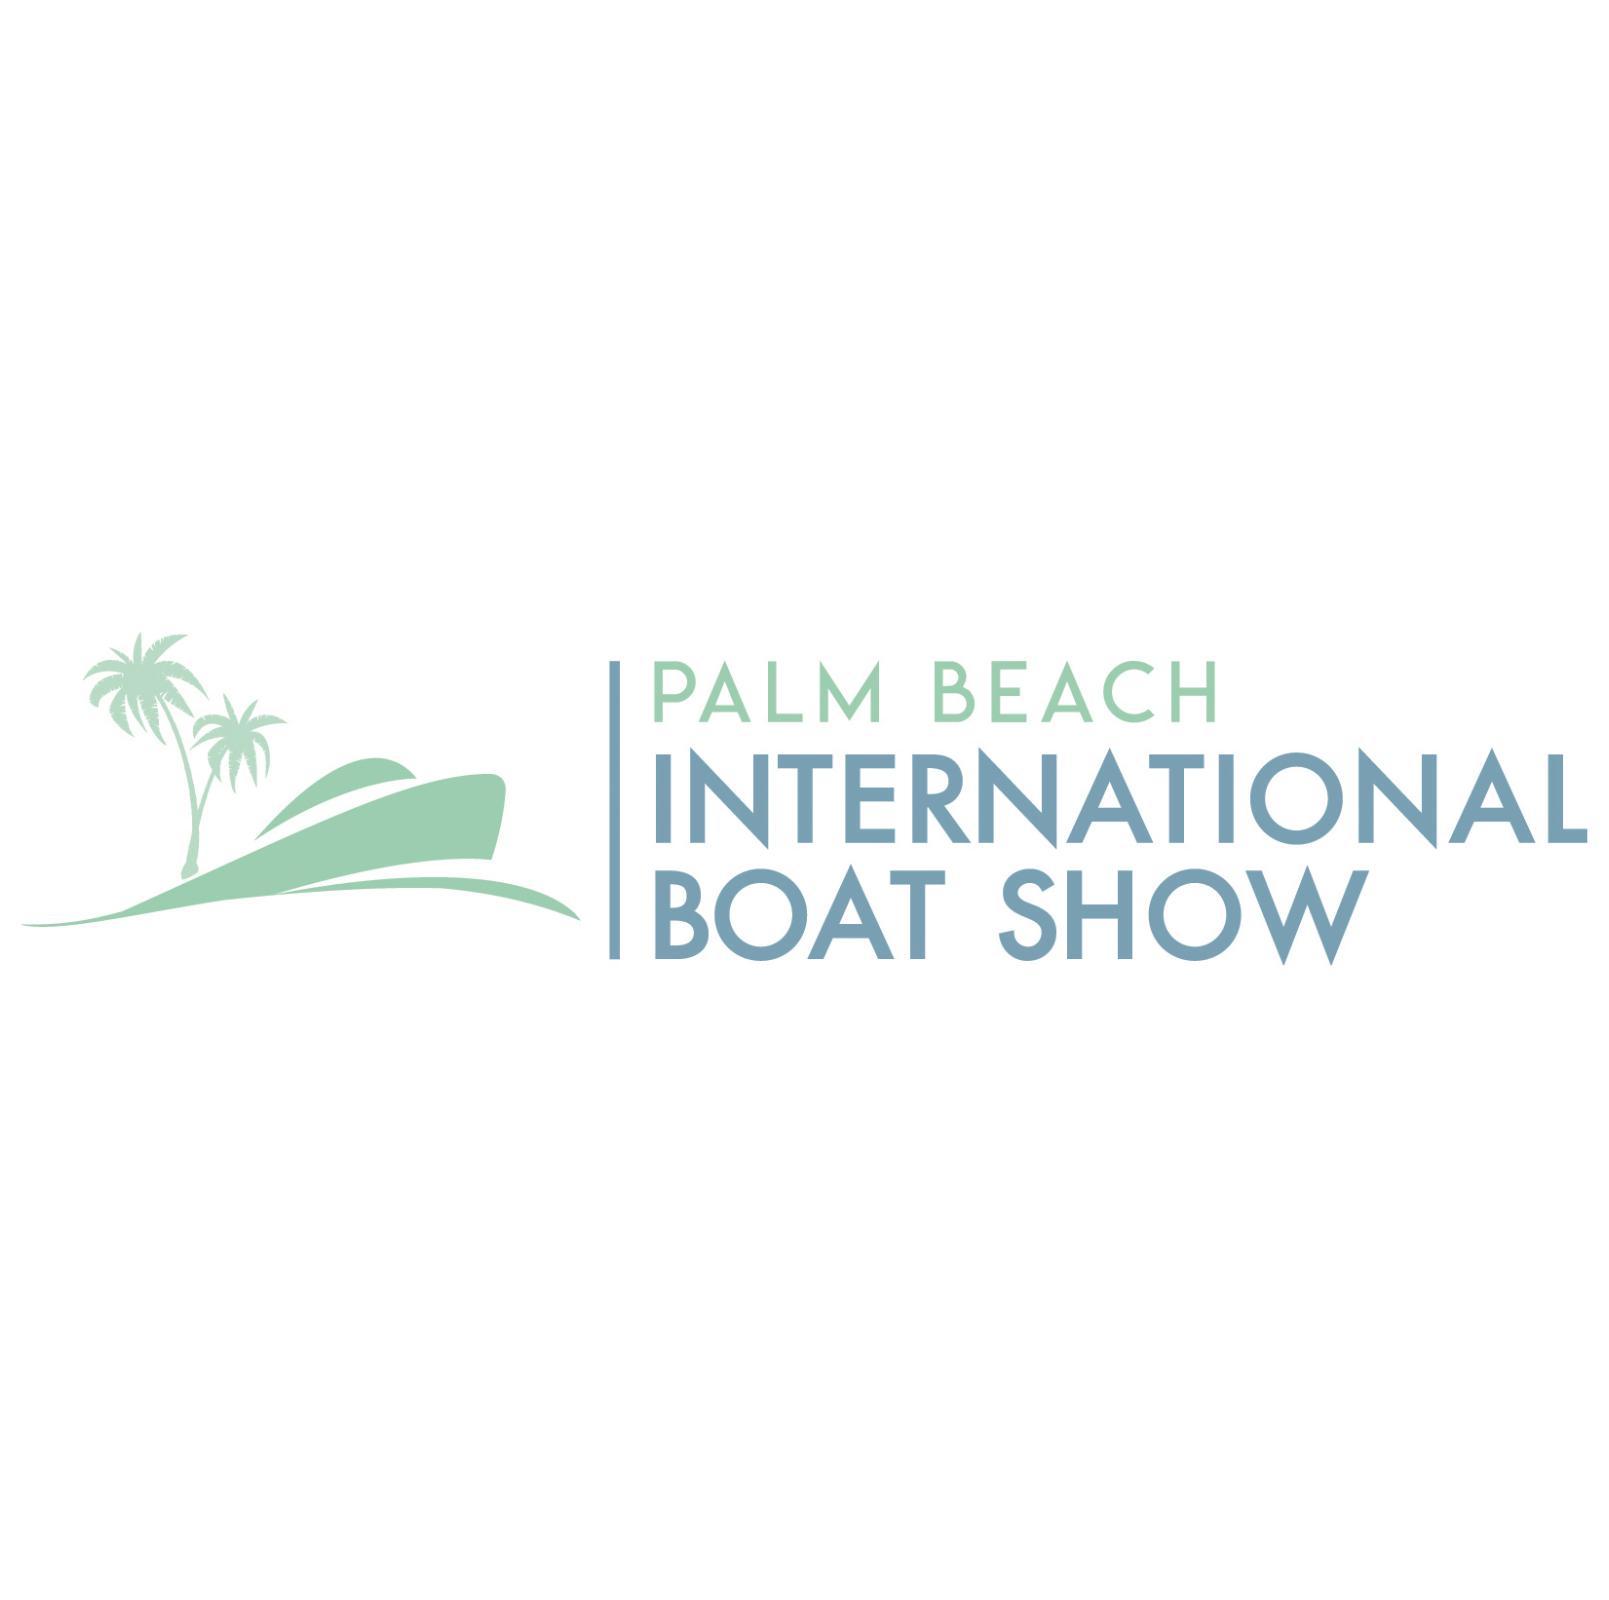 West Palm Beach In 2019: 2019 West Palm Beach Boatshow